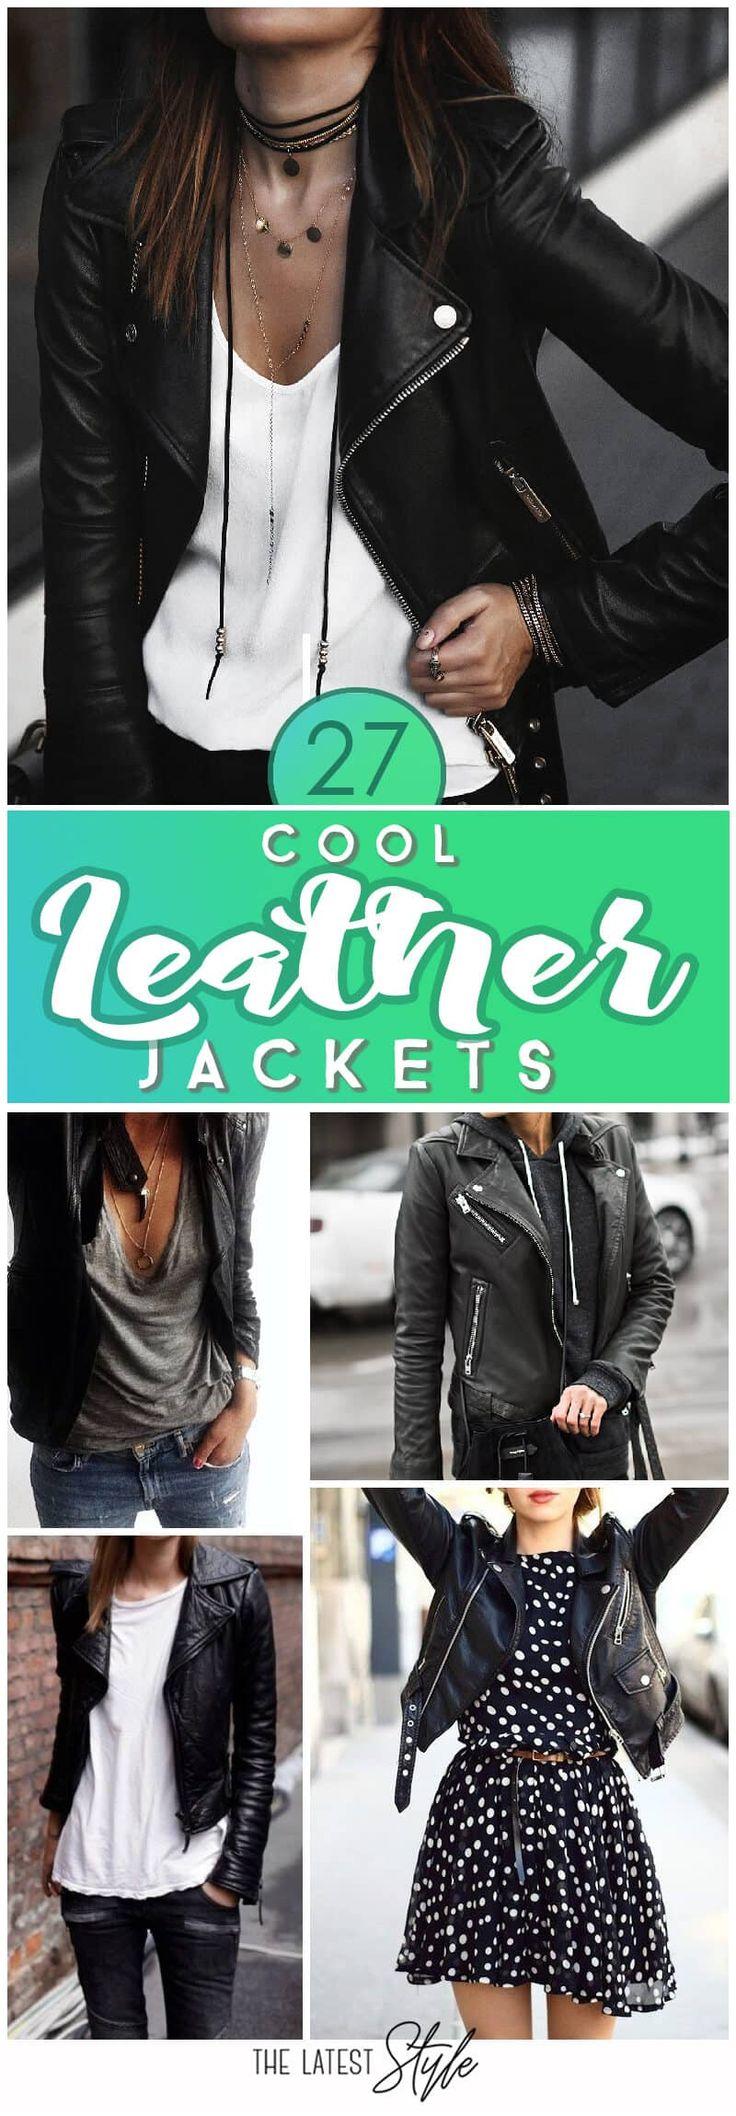 27 coole Lederjacke-Outfits für diesen Herbst – #coole #DamenLederjacke #diesen…